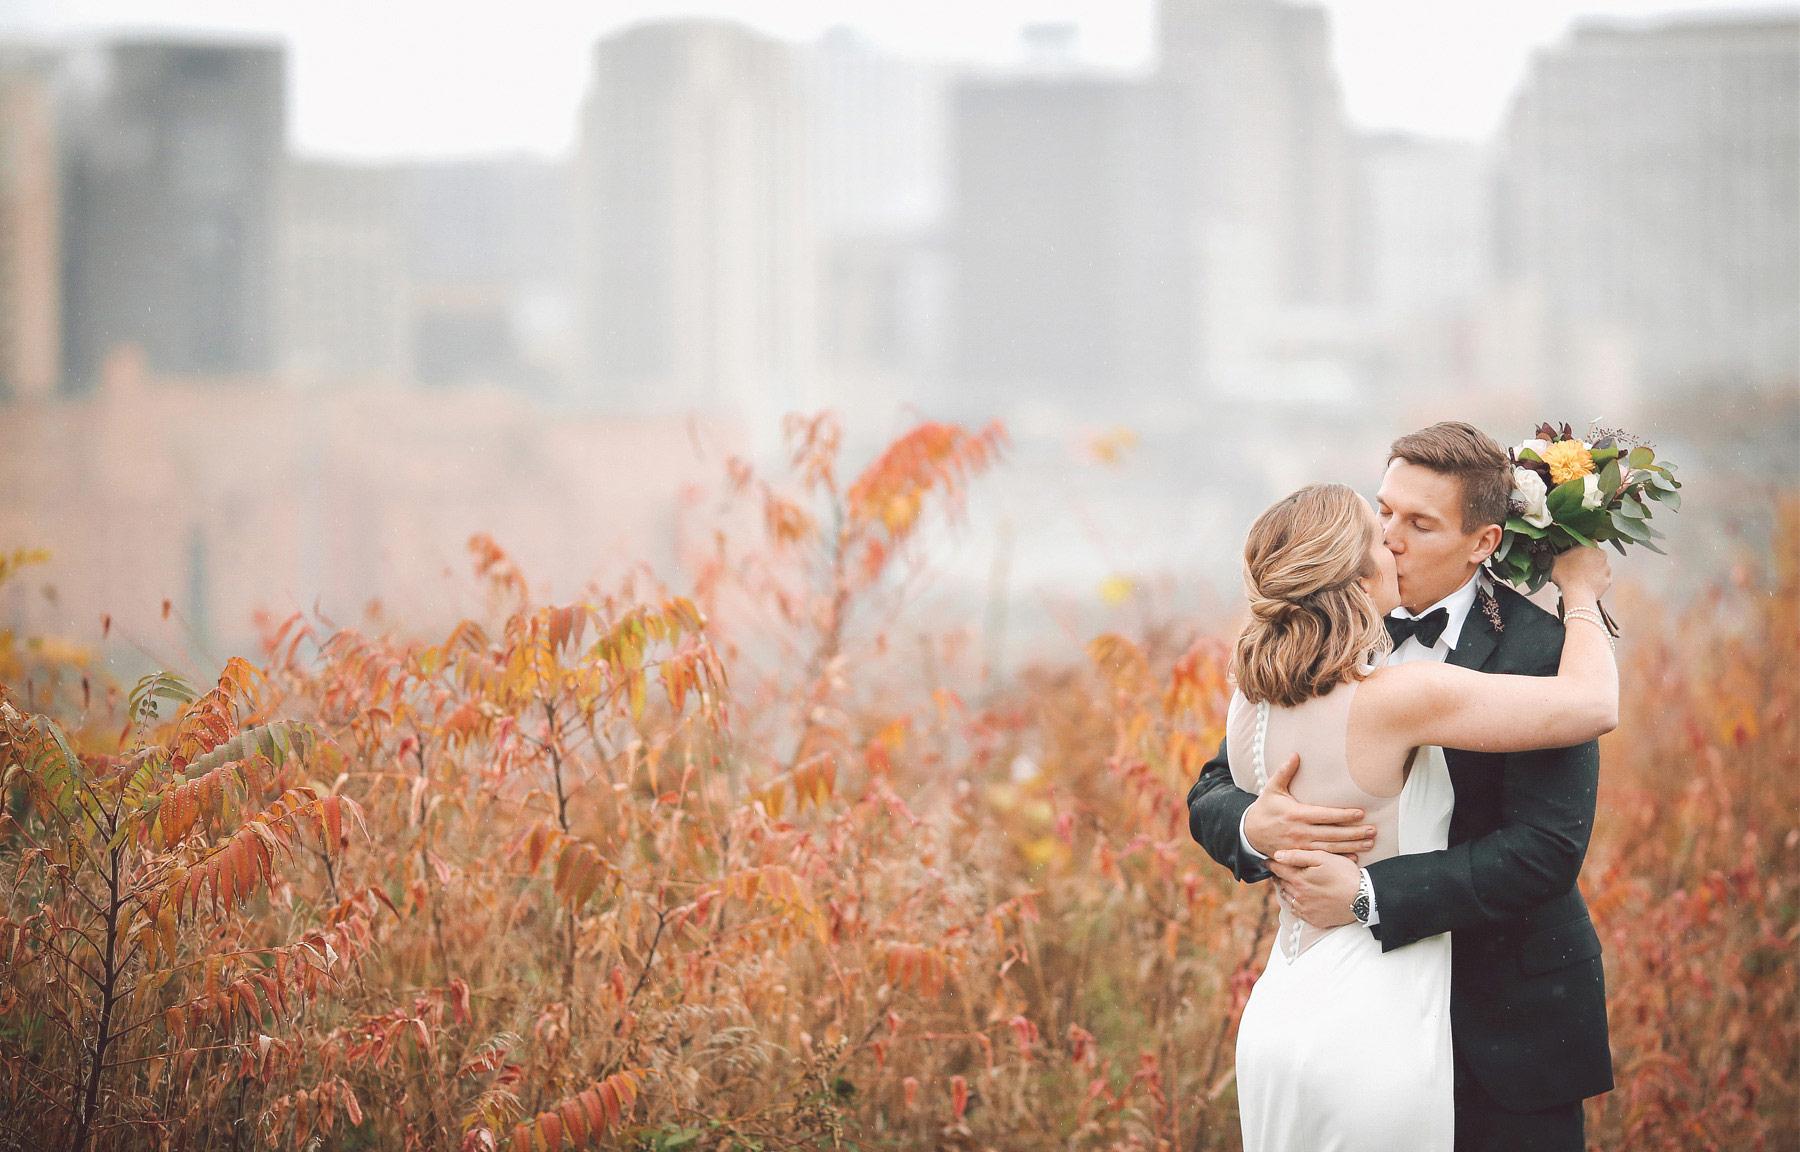 15-Saint-Paul-Minnesota-Wedding-Photographer-by-Andrew-Vick-Photography-Fall-Autumn-Bride-Groom-Flowers-Kiss-Rain-Vintage-Kathryn-and-Sam.jpg